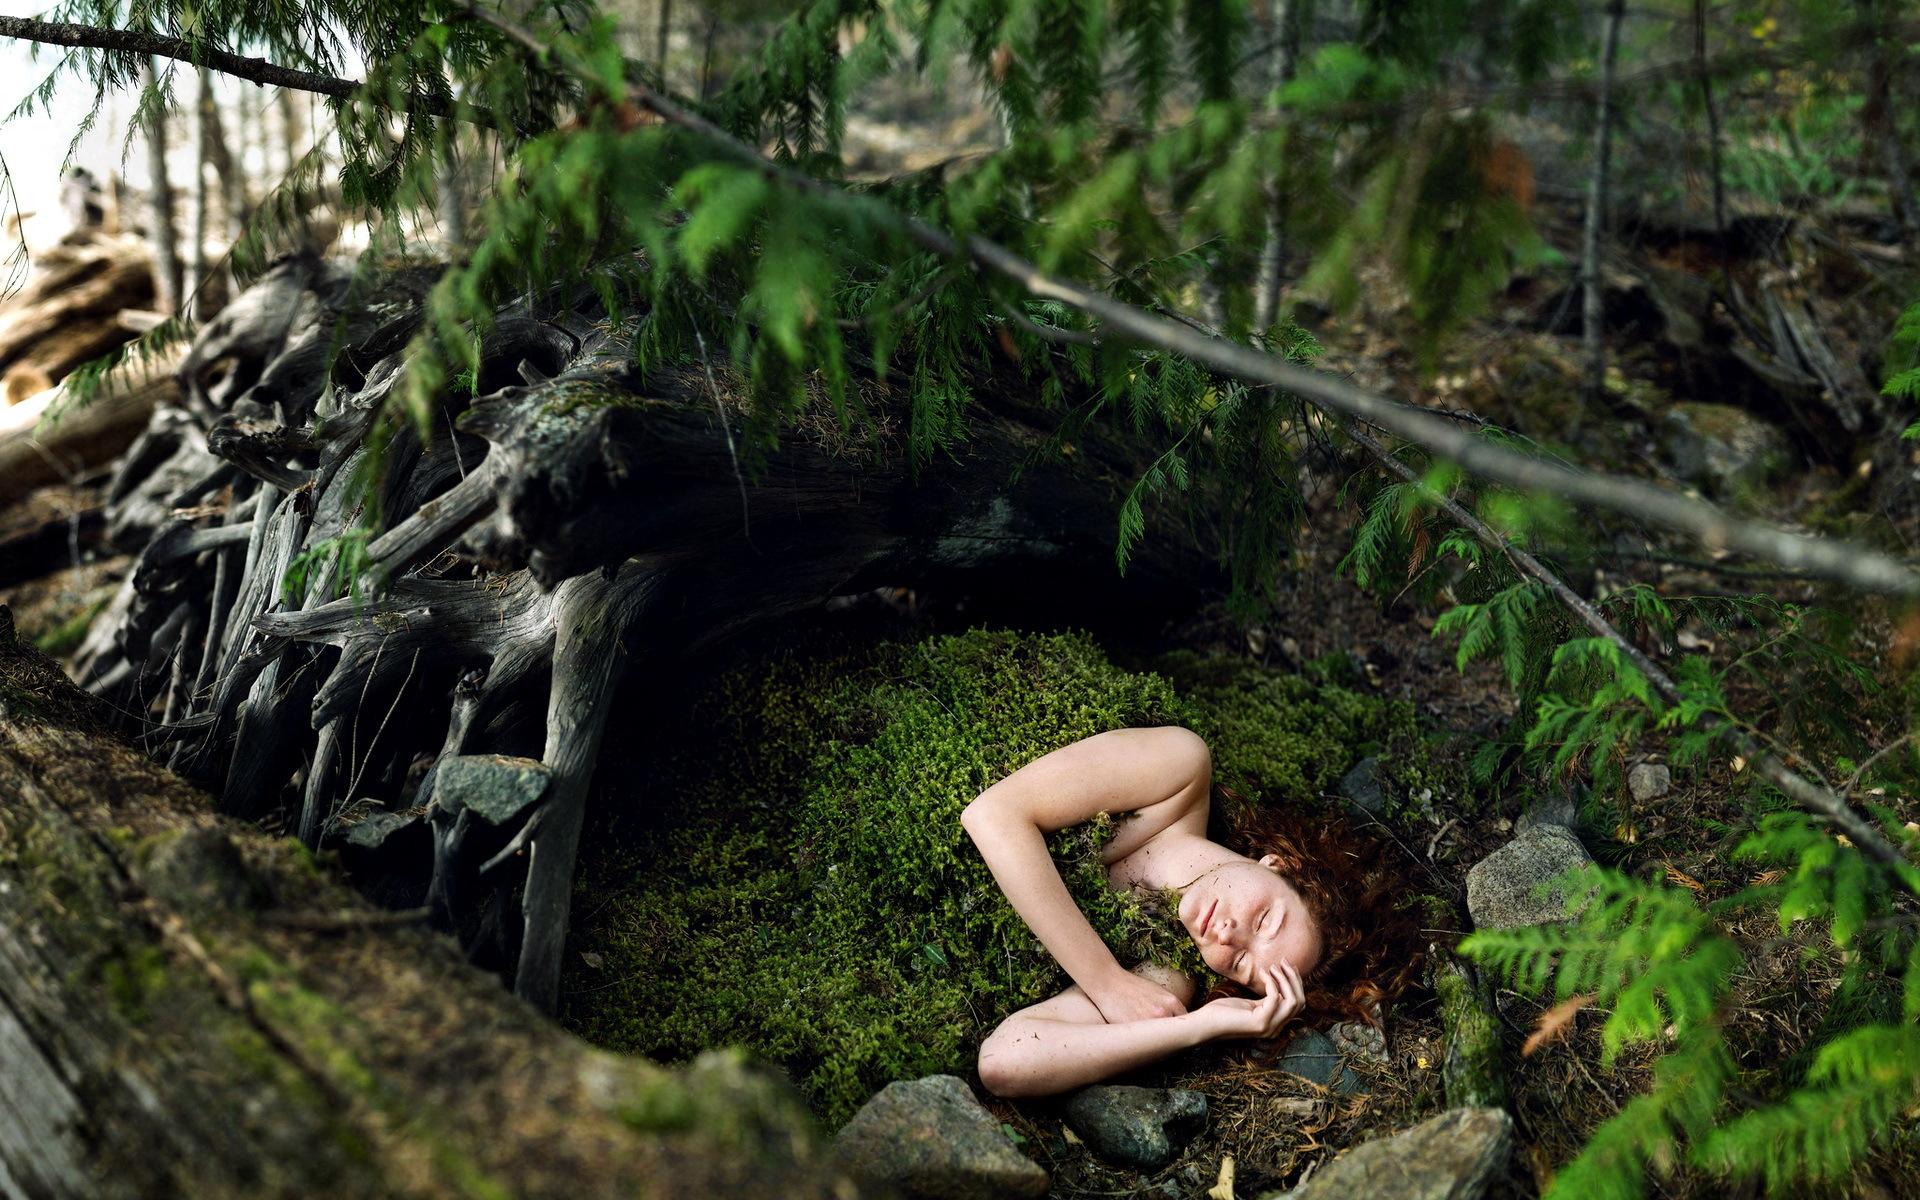 Fantastic Wallpaper Forest Girl - Nature___Forest_Girl_sleeping_in_moss_042540_  Gallery_248540 .jpg